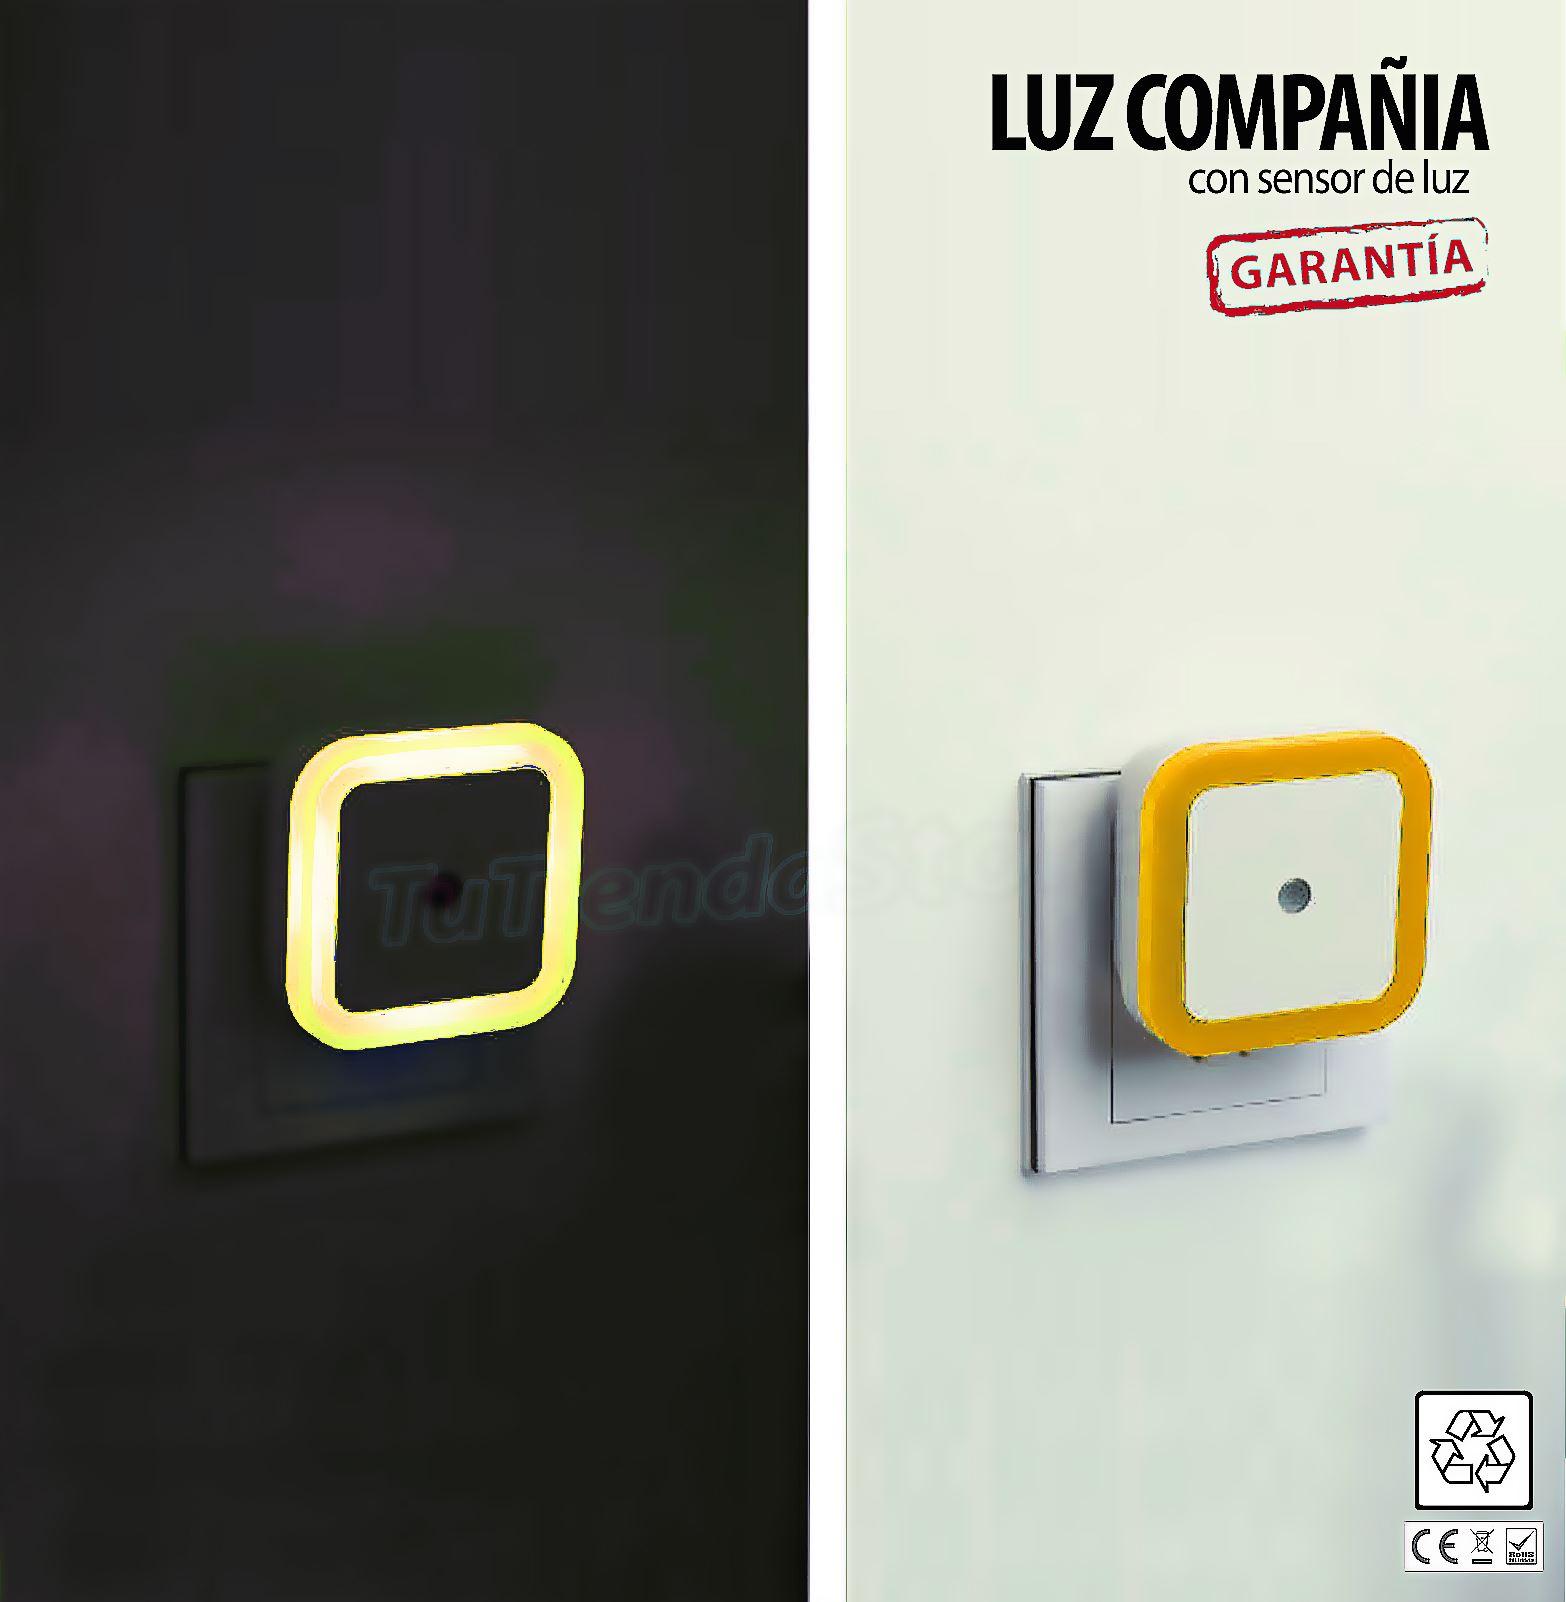 LUZ-LED-para-ninos-infantil-compania-noche-con-sensor-automatico-VARIOS-COLORES